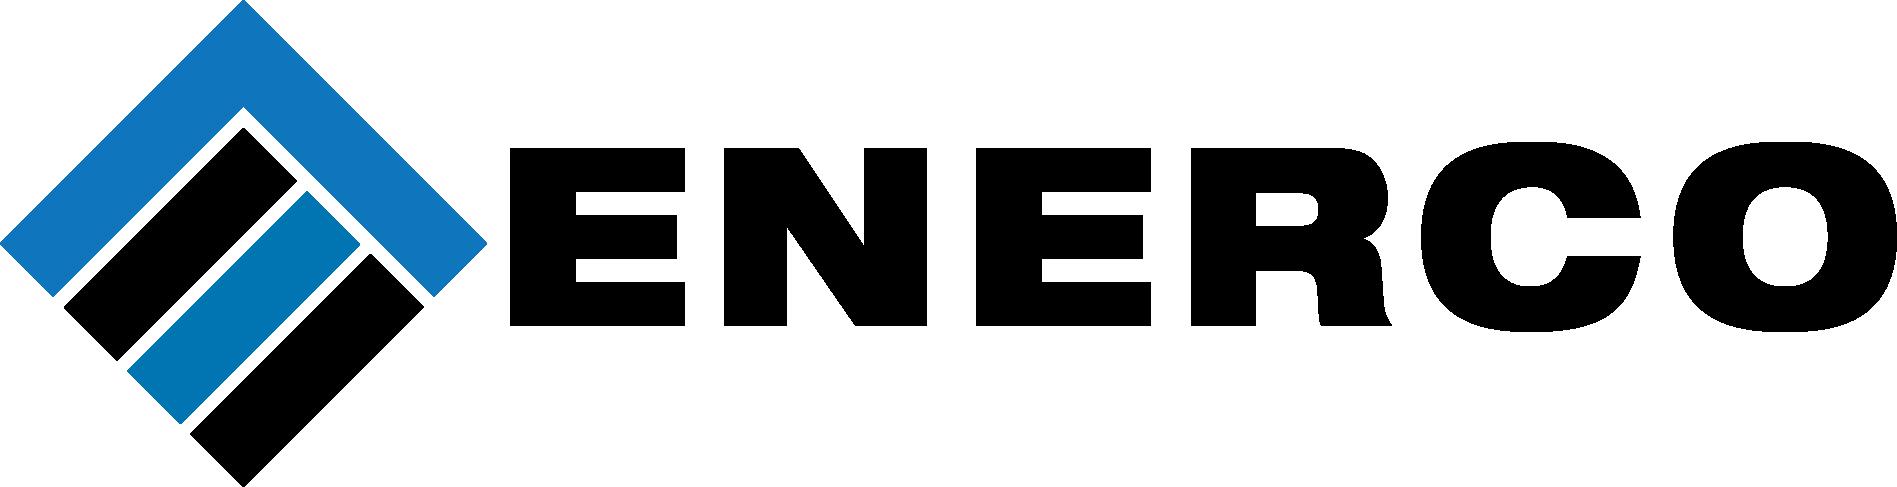 Propane Adapter (1/4in Male Pipe x 1in20 Female Throwaway Cyl Threads) Bulk